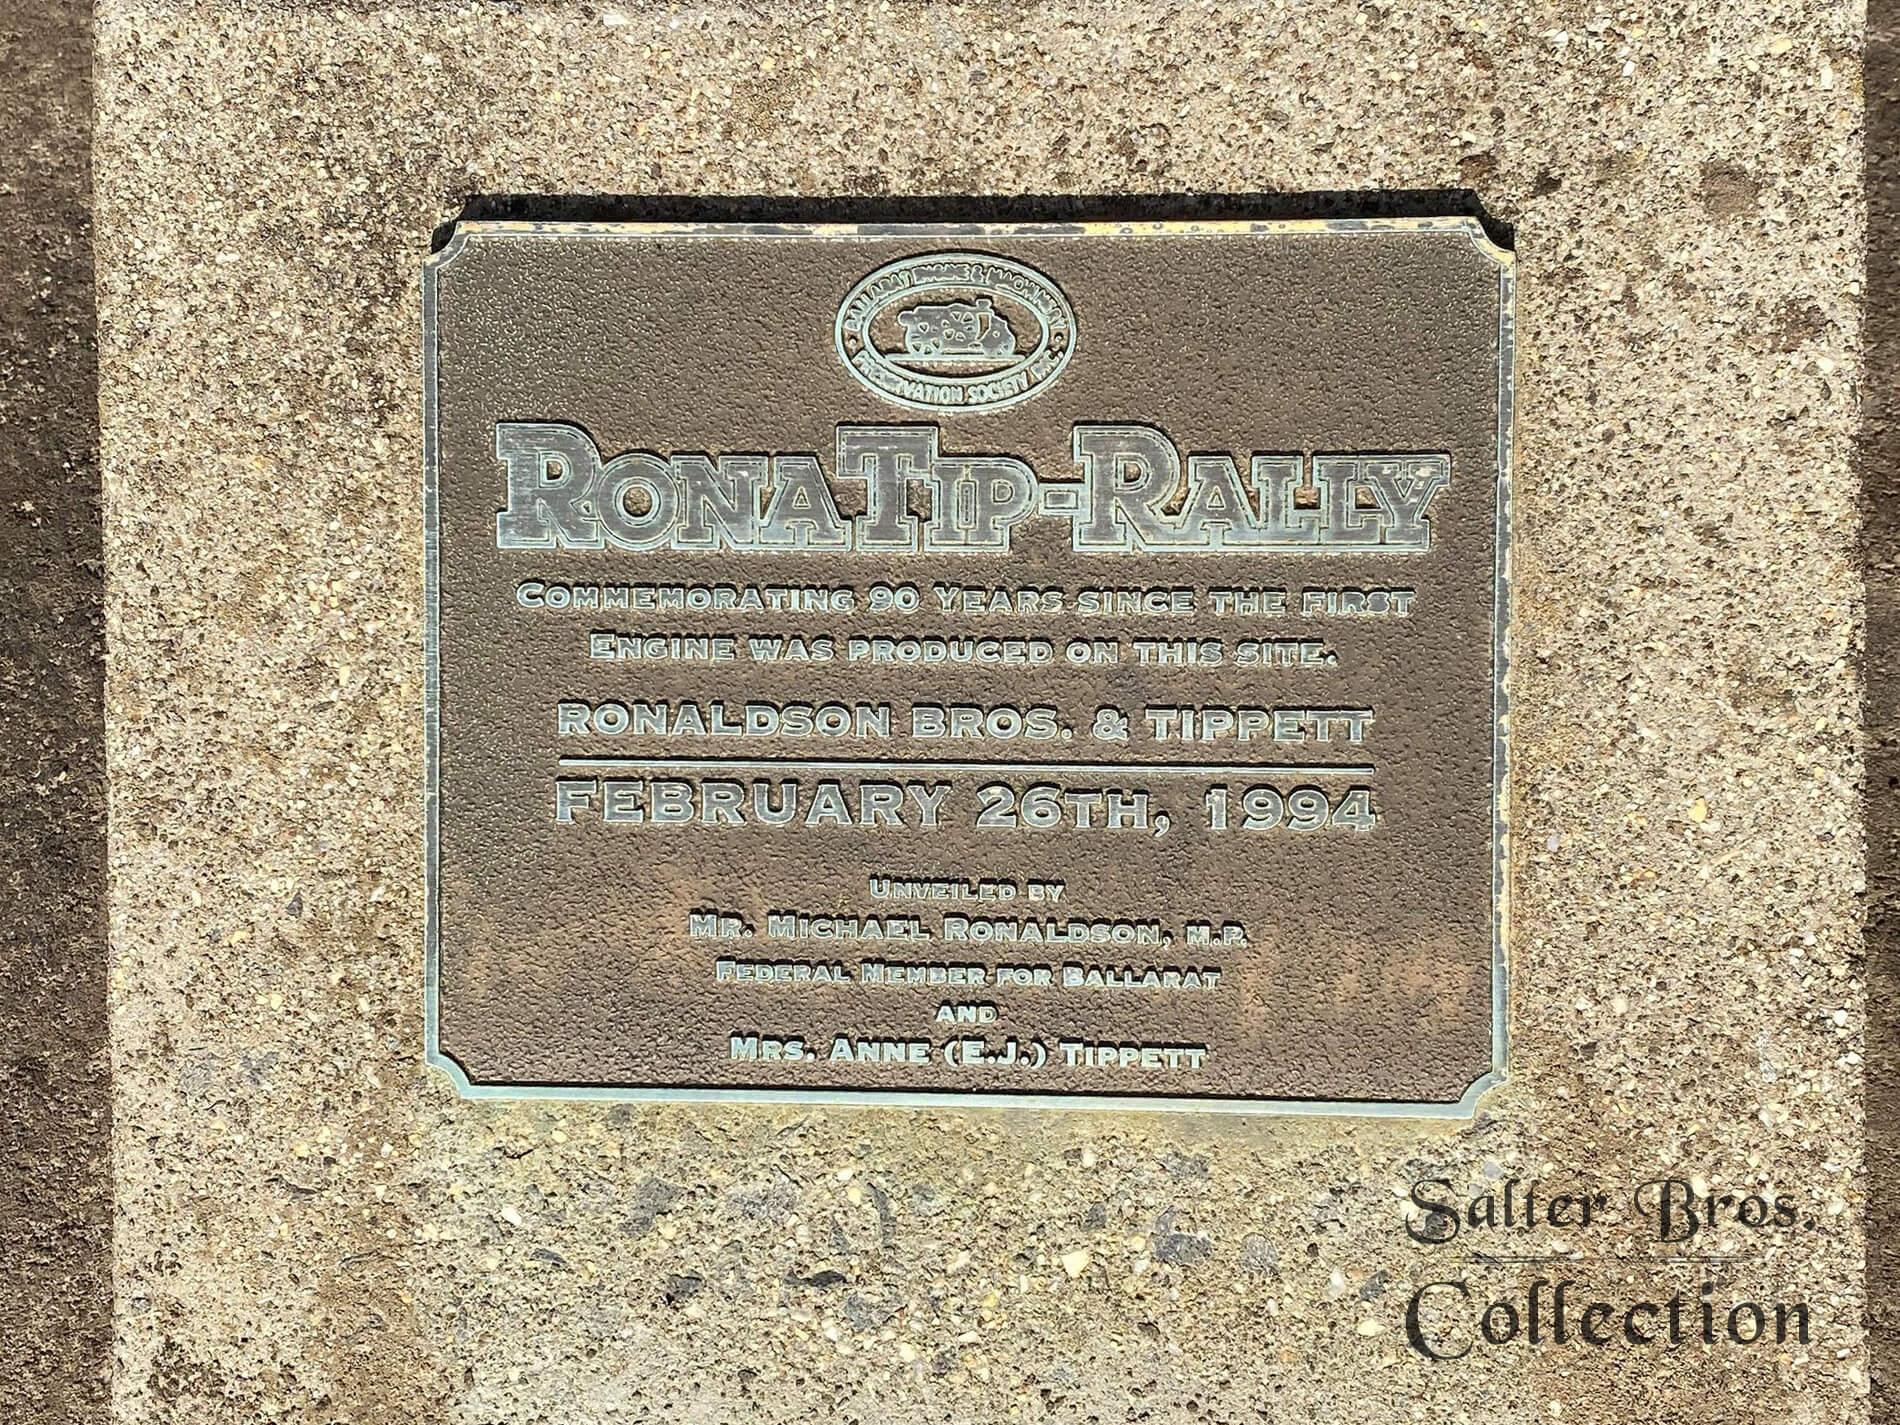 Ronaldson Tippett Factory Plaque